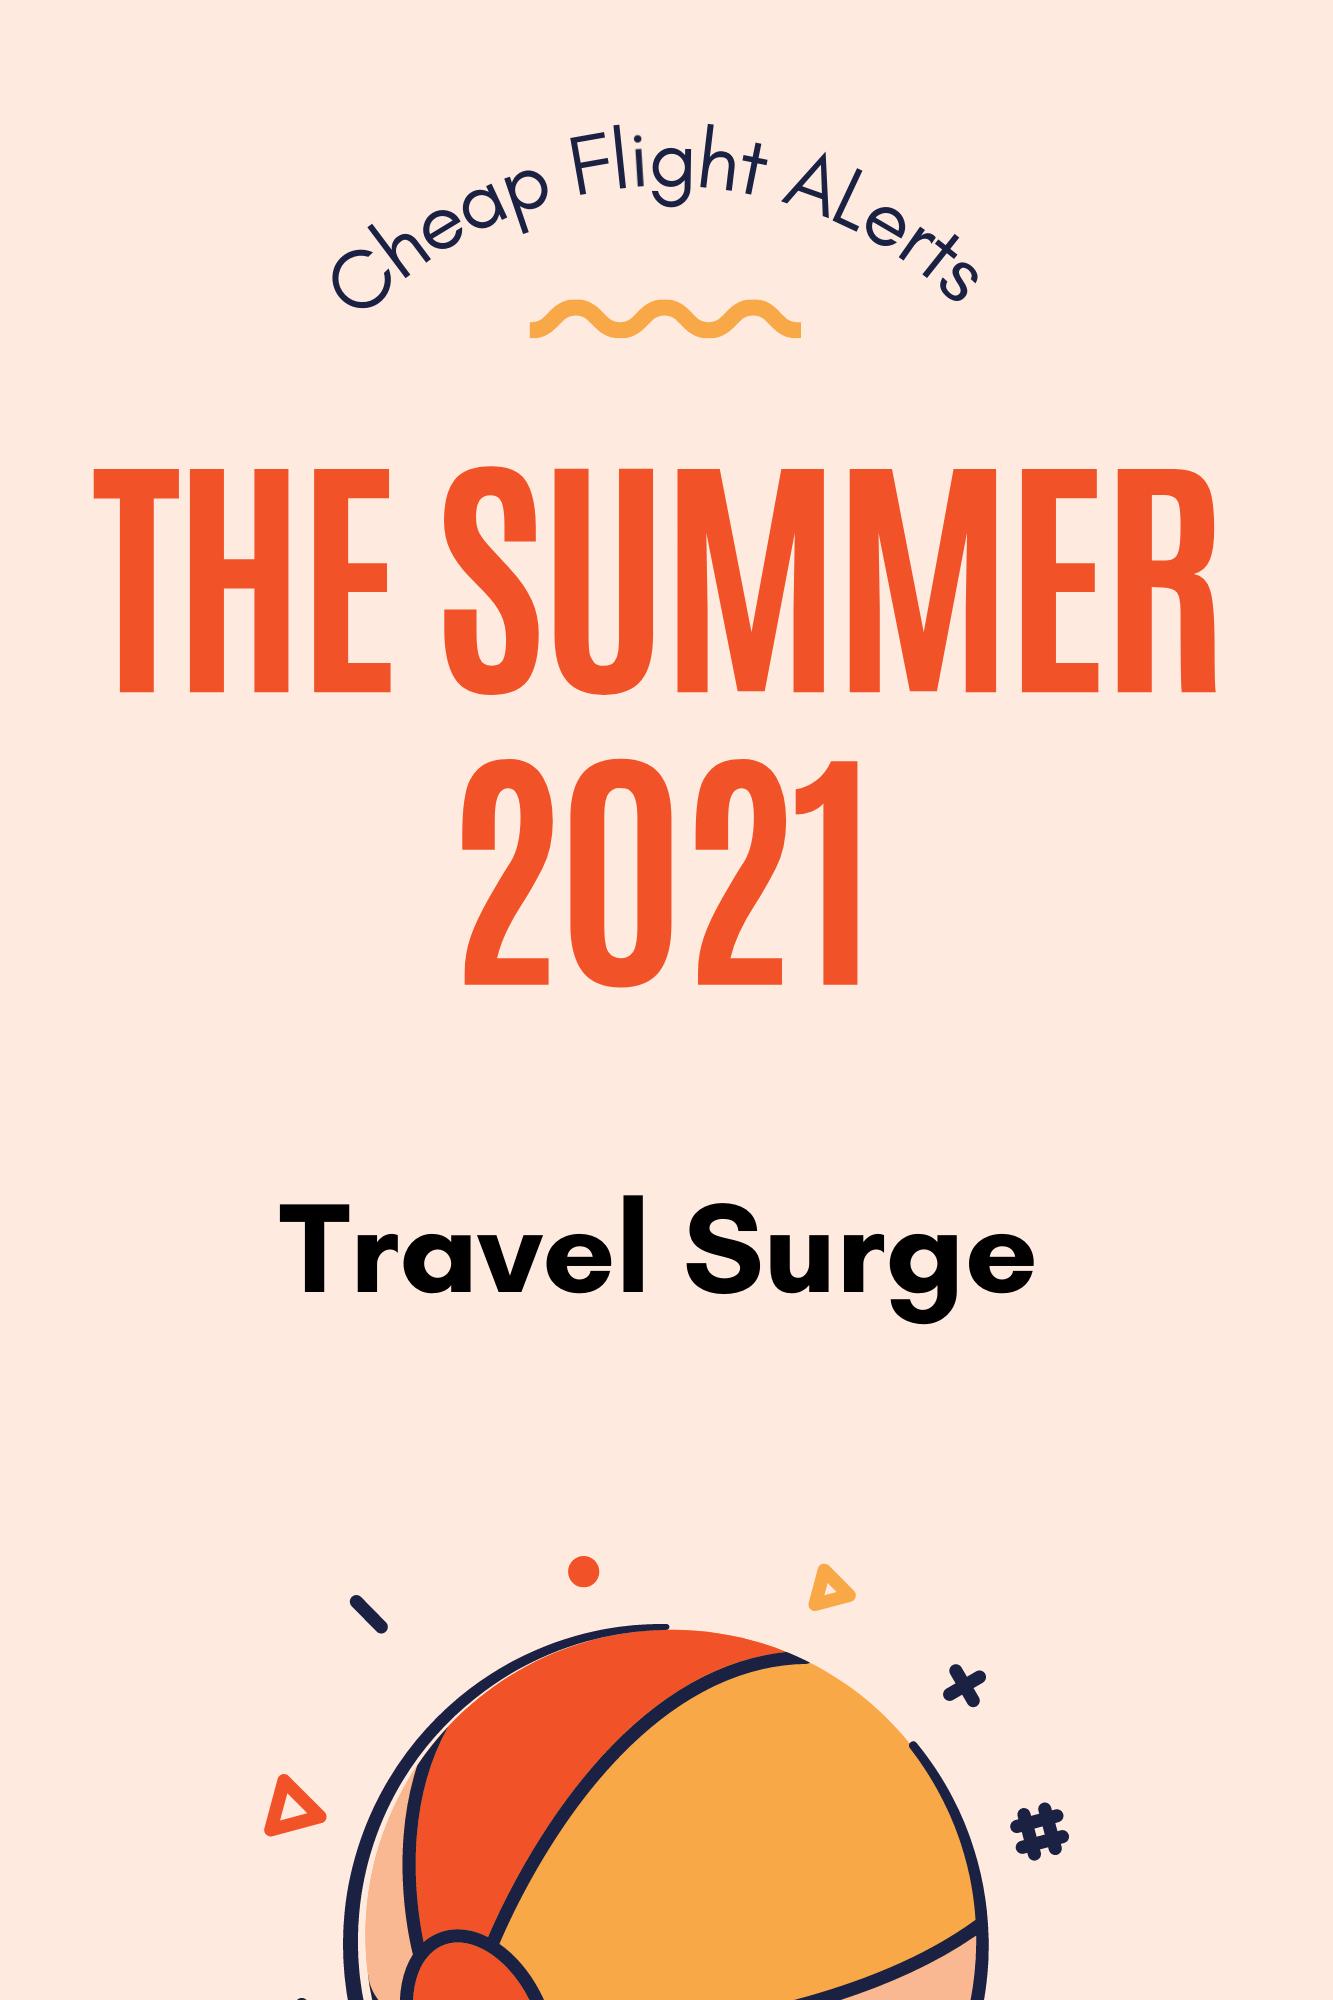 Summer of 2021 Travel Surge